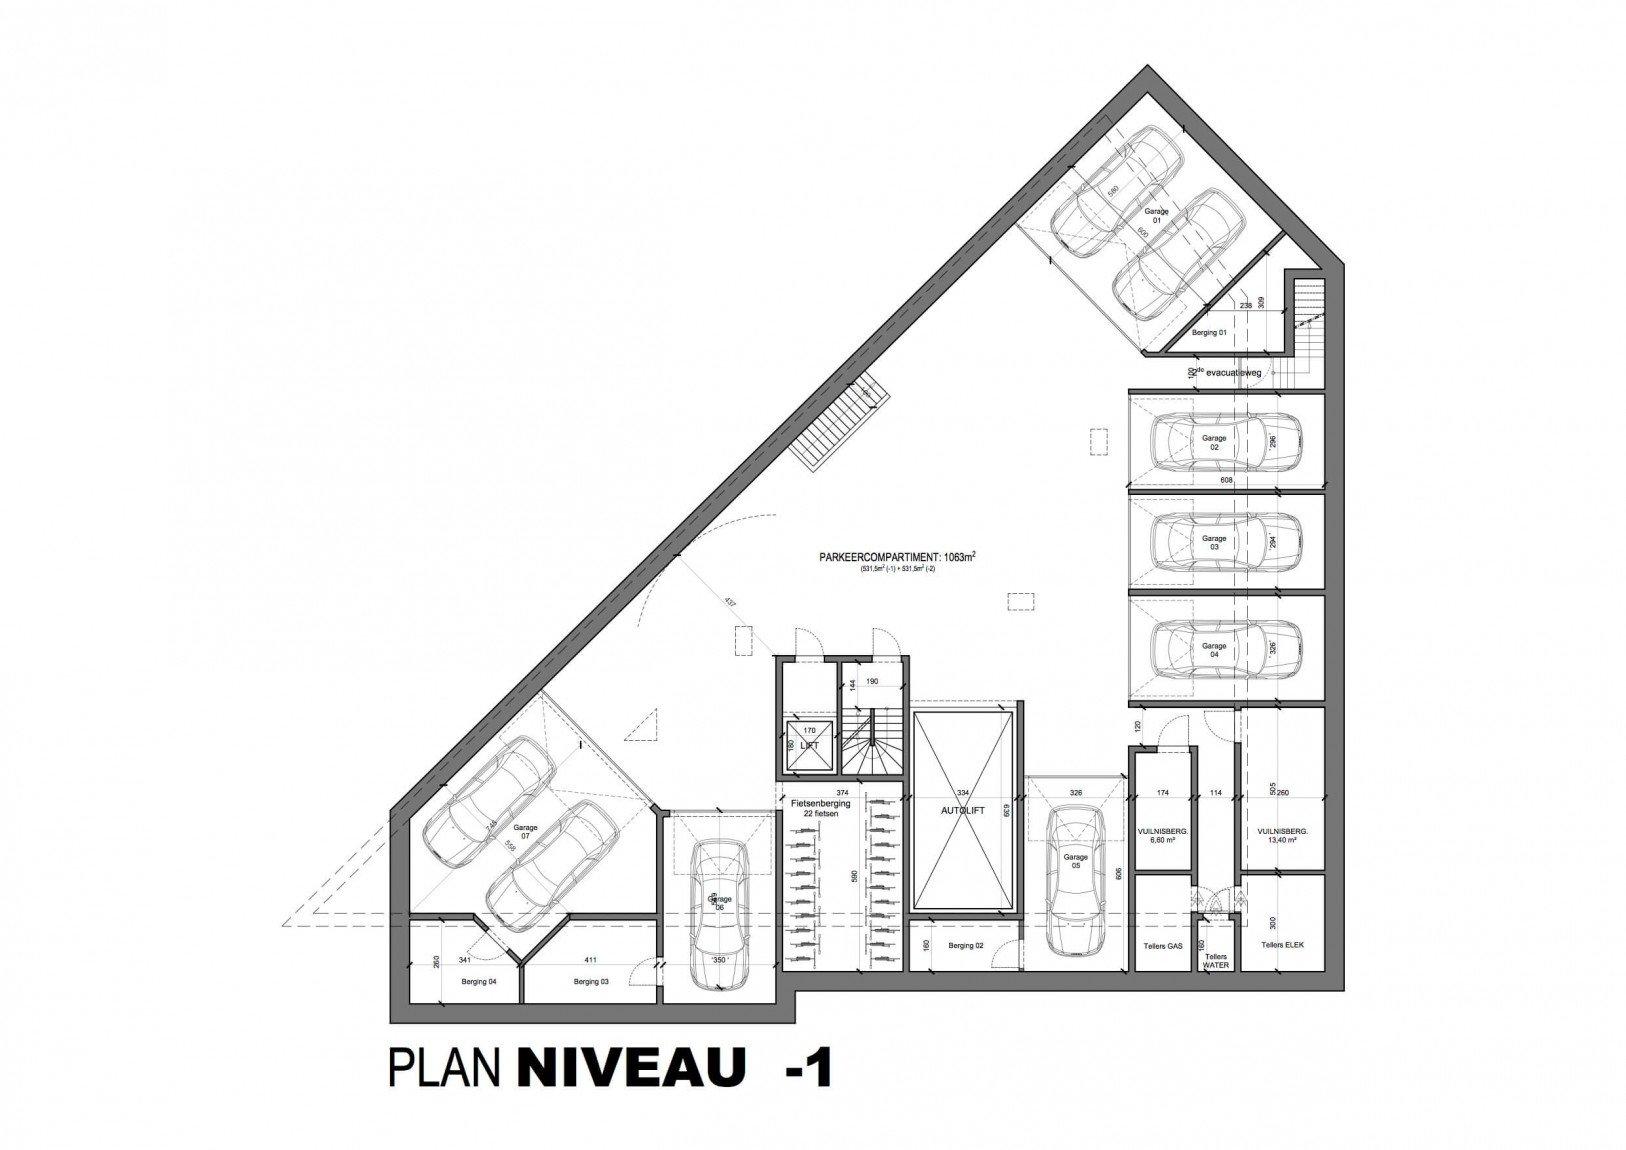 PIERRE PAULIN - Rietveld - Niveau-1